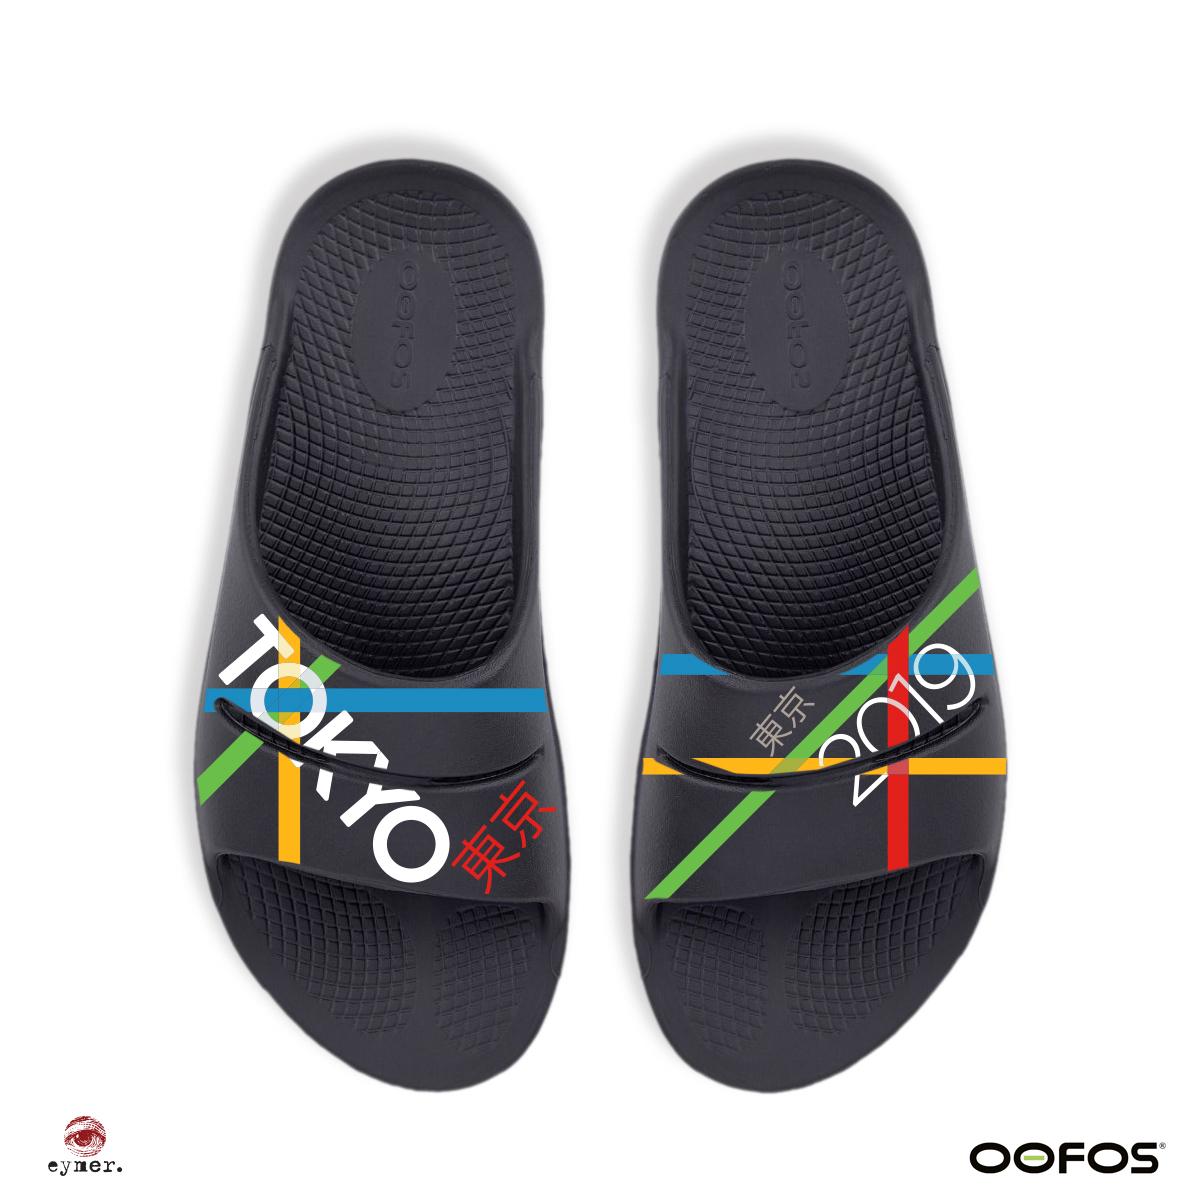 OOah sandal slide   Tokyo